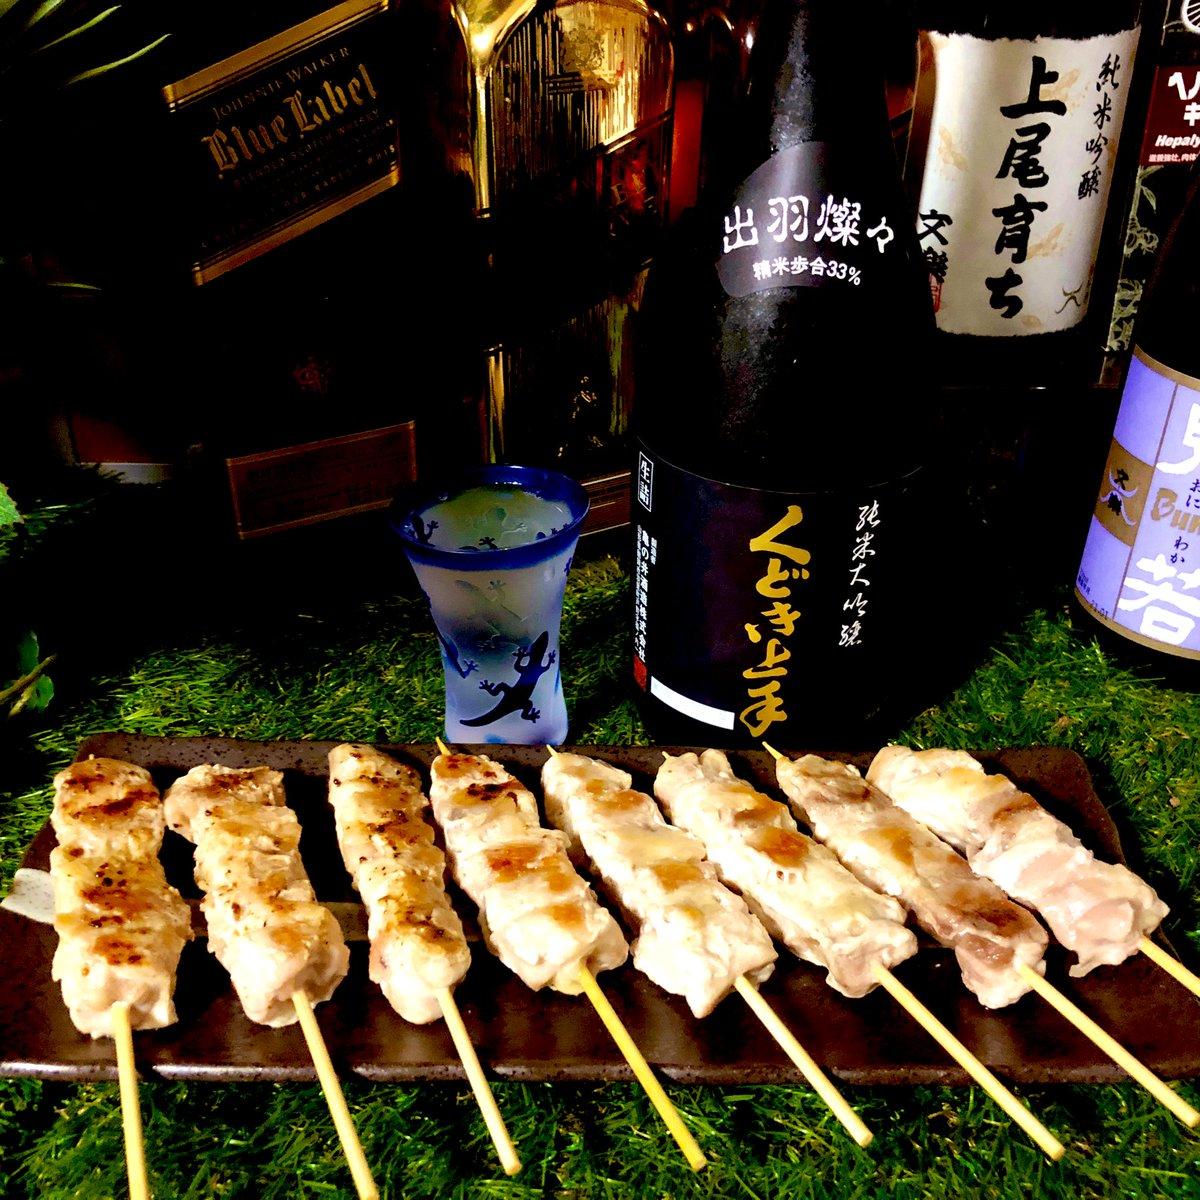 test ツイッターメディア - 今日は上尾にある大正元年創業の酒屋さん『石川屋』で買った山形県鶴岡市の酒蔵、亀の井酒造さんの『くどき上手』の純米大吟醸🍶 間違いない美味さ アテはOKストアの冷凍焼き鳥(生)を 塩・マキシマムの2種類の味付けで🔥 マキシマムのヤツにCoCo壱のとび辛スパイスでさらに邪道でも美味し⚡️ #日本酒 https://t.co/PFFXhcCack